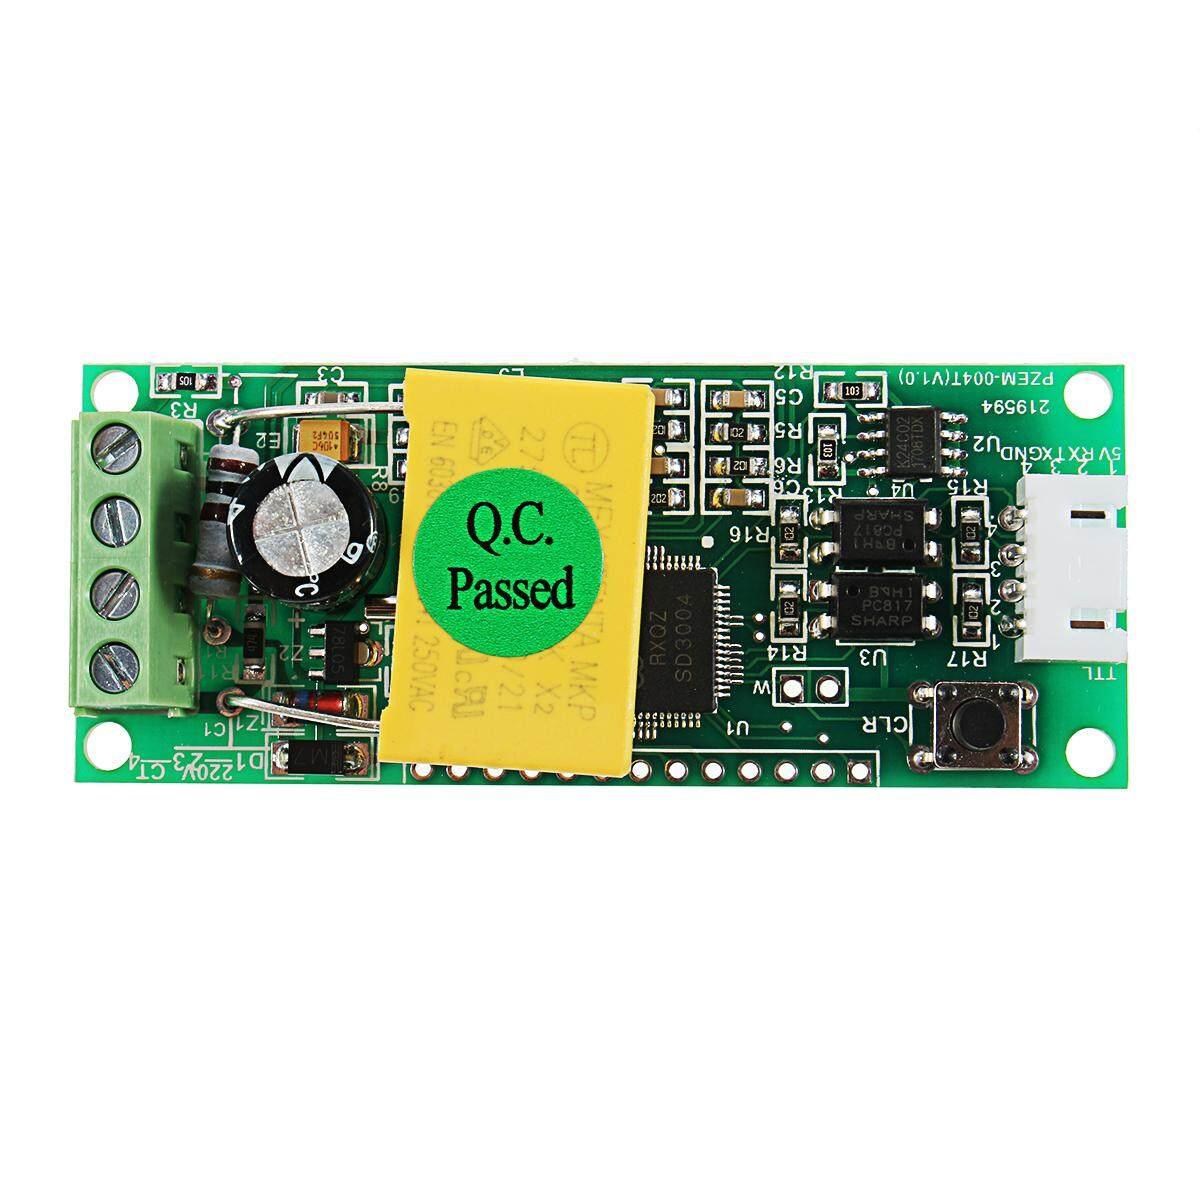 AC Digital Meteran Multifungsi Watt Power Volt Amp TTL Uji Arus Modul PZEM-004T dengan Coil 0-100A 80-260 V AC untuk arduino-Internasional